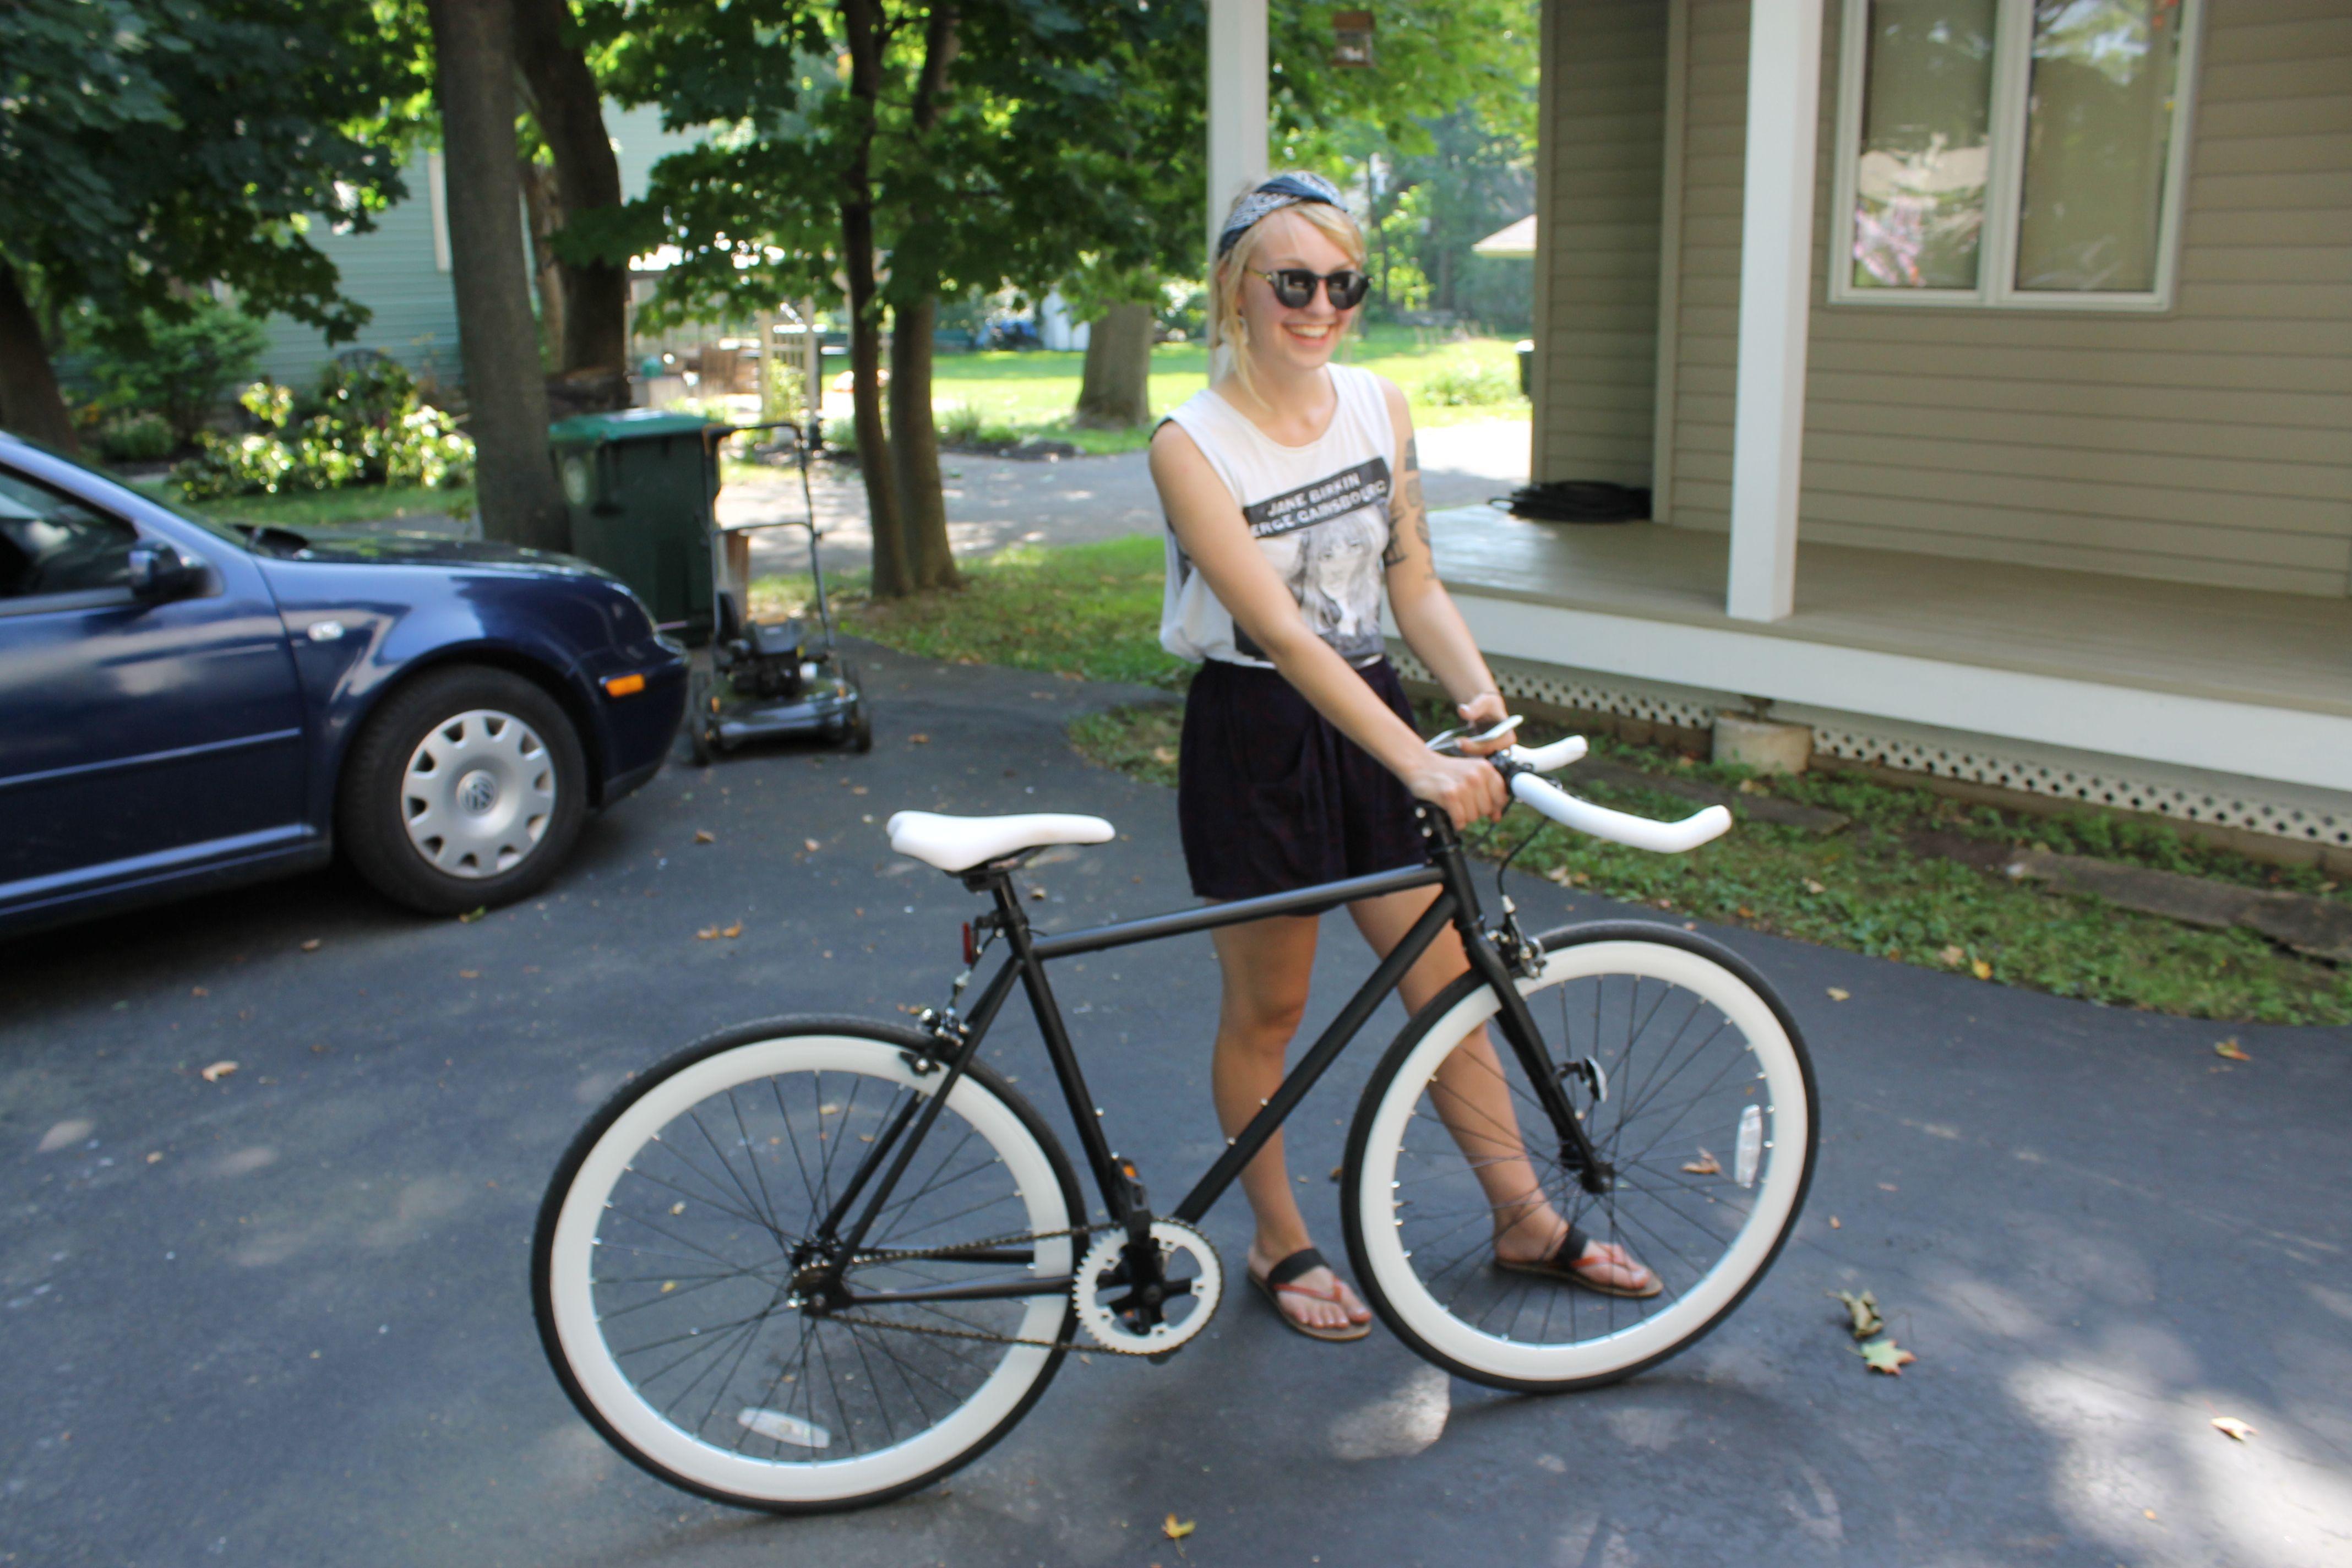 Custom Vilano Fixed Gear Fixed Gear Bike Bicycle